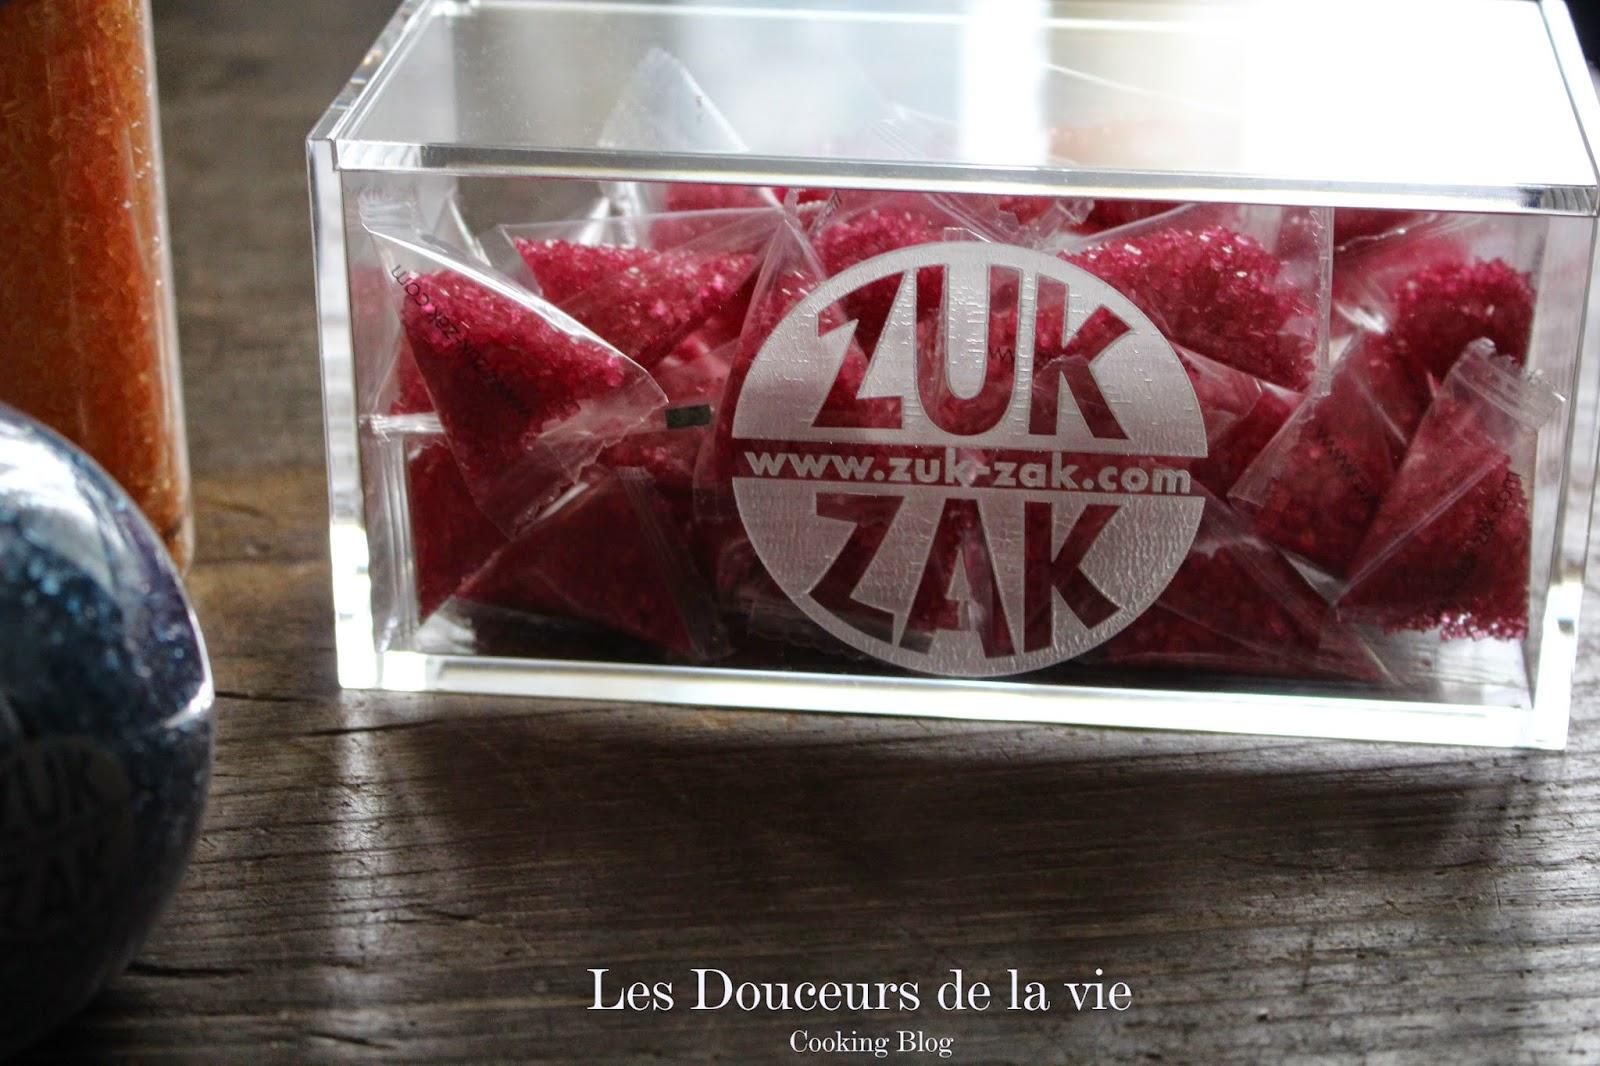 Partenariat zuk zak blogs de cuisine for Partenariat cuisine